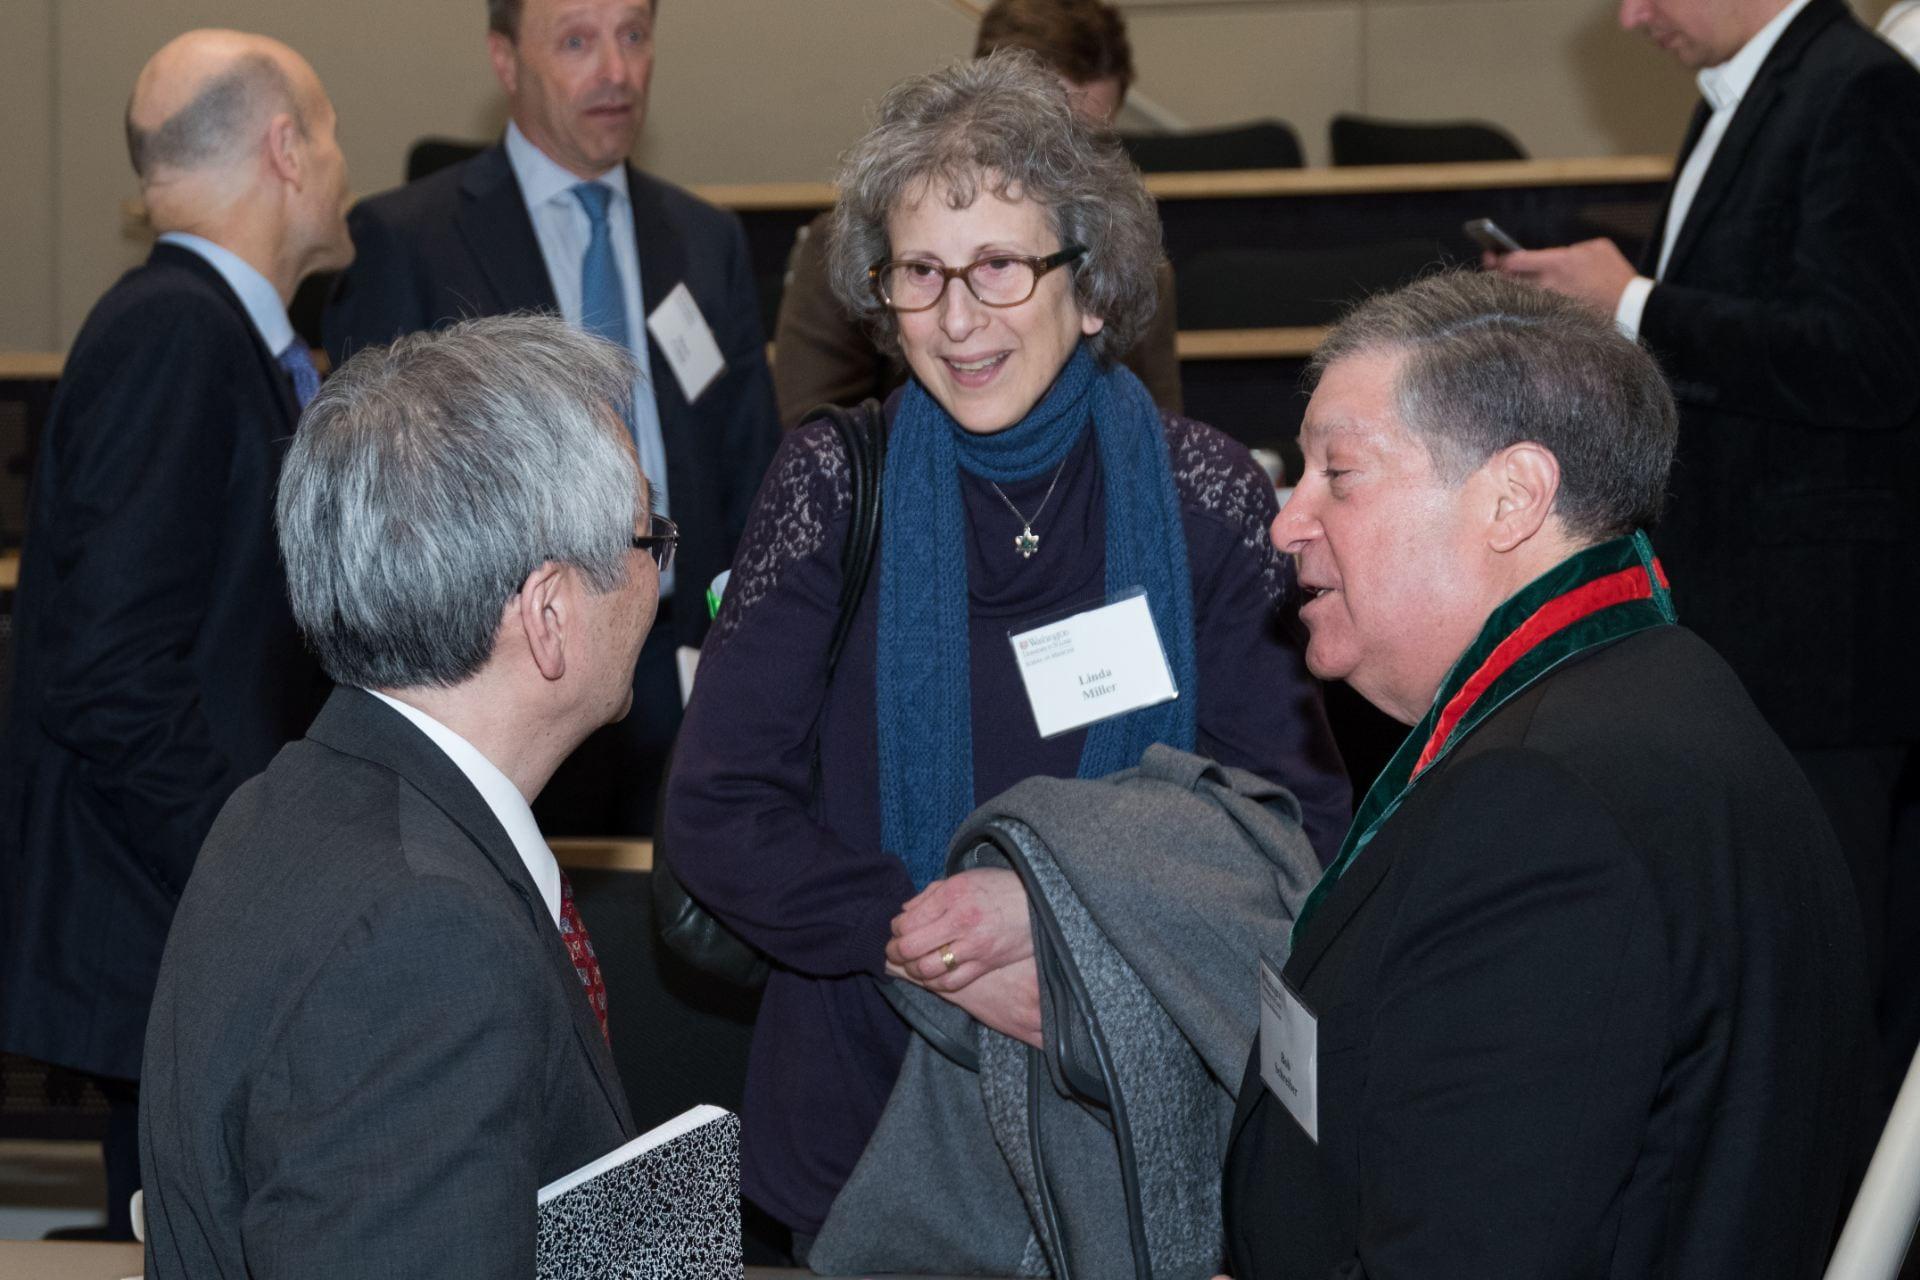 Wayne Yokoyama, special guest Dr. Linda Miller (Executive Editor of AACR's Cancer Immunology Research) and Bob Schreiber